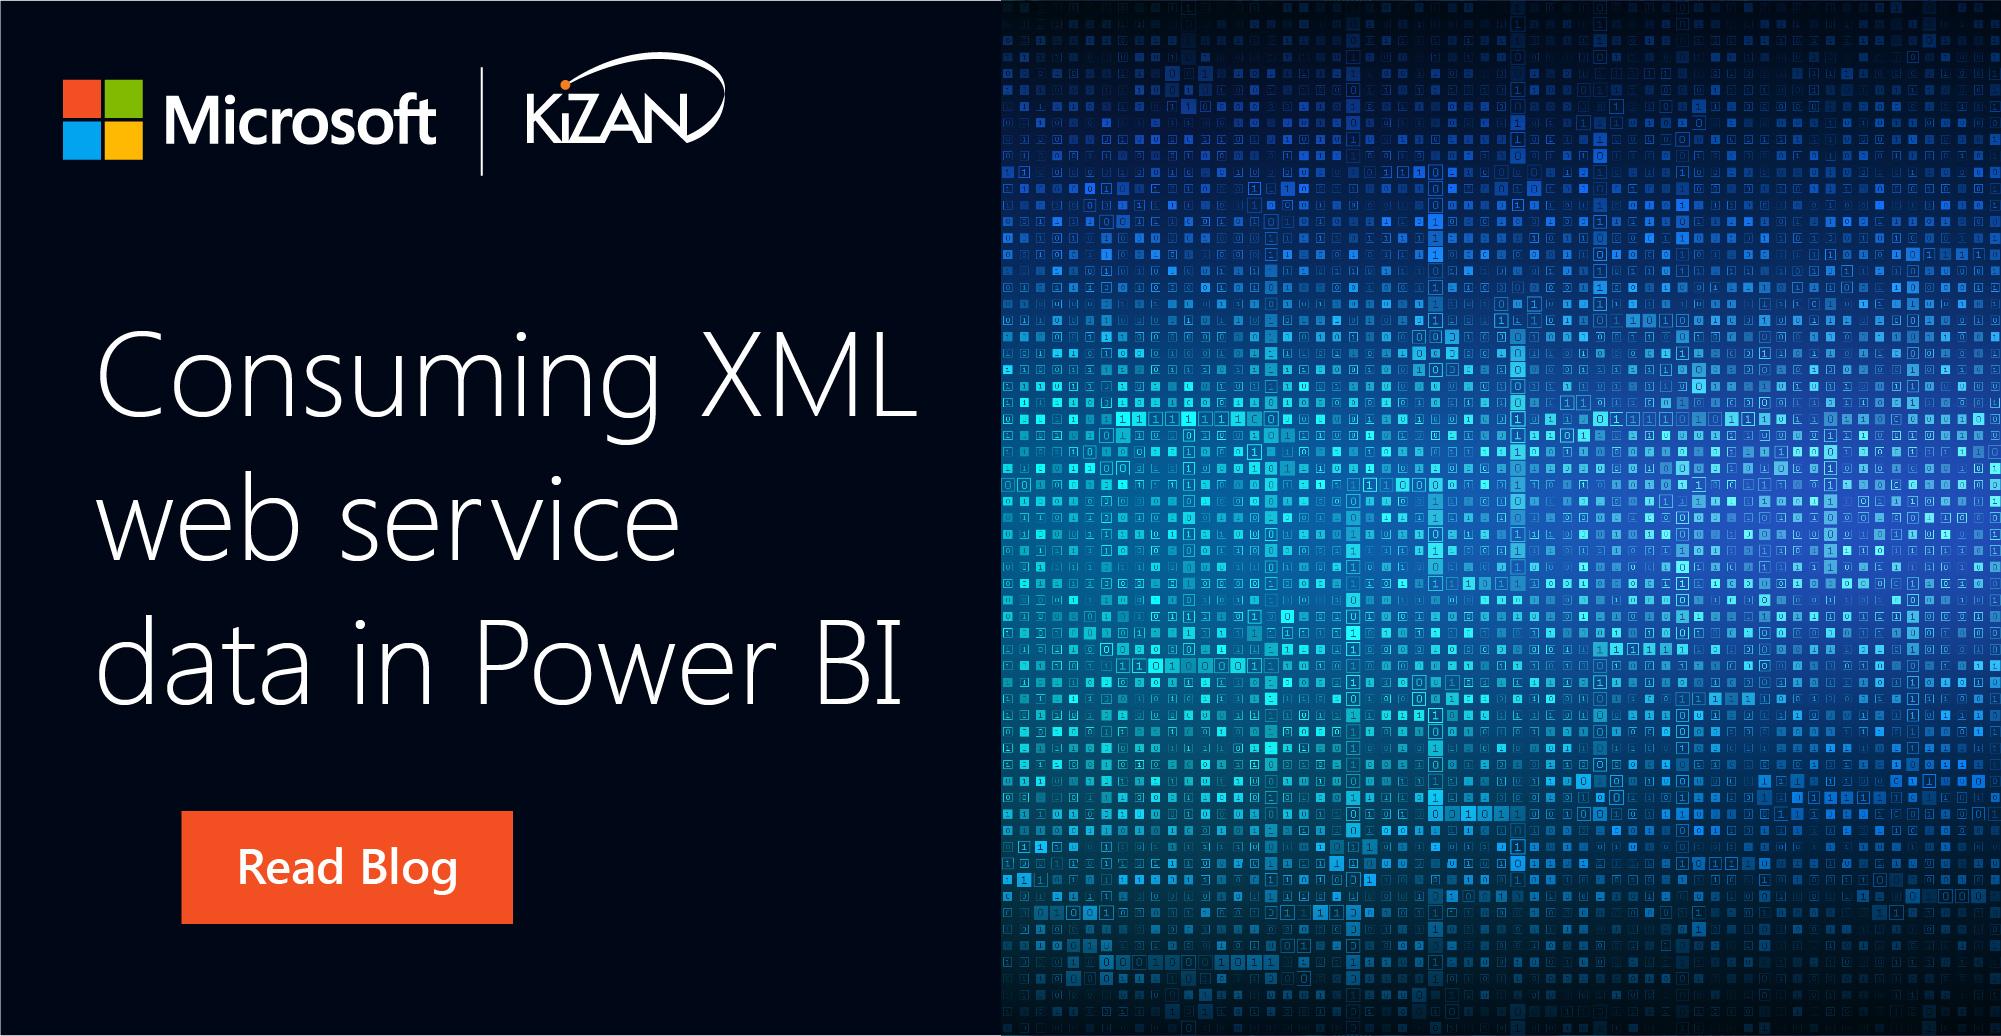 Consuming XML web service data in Power BI